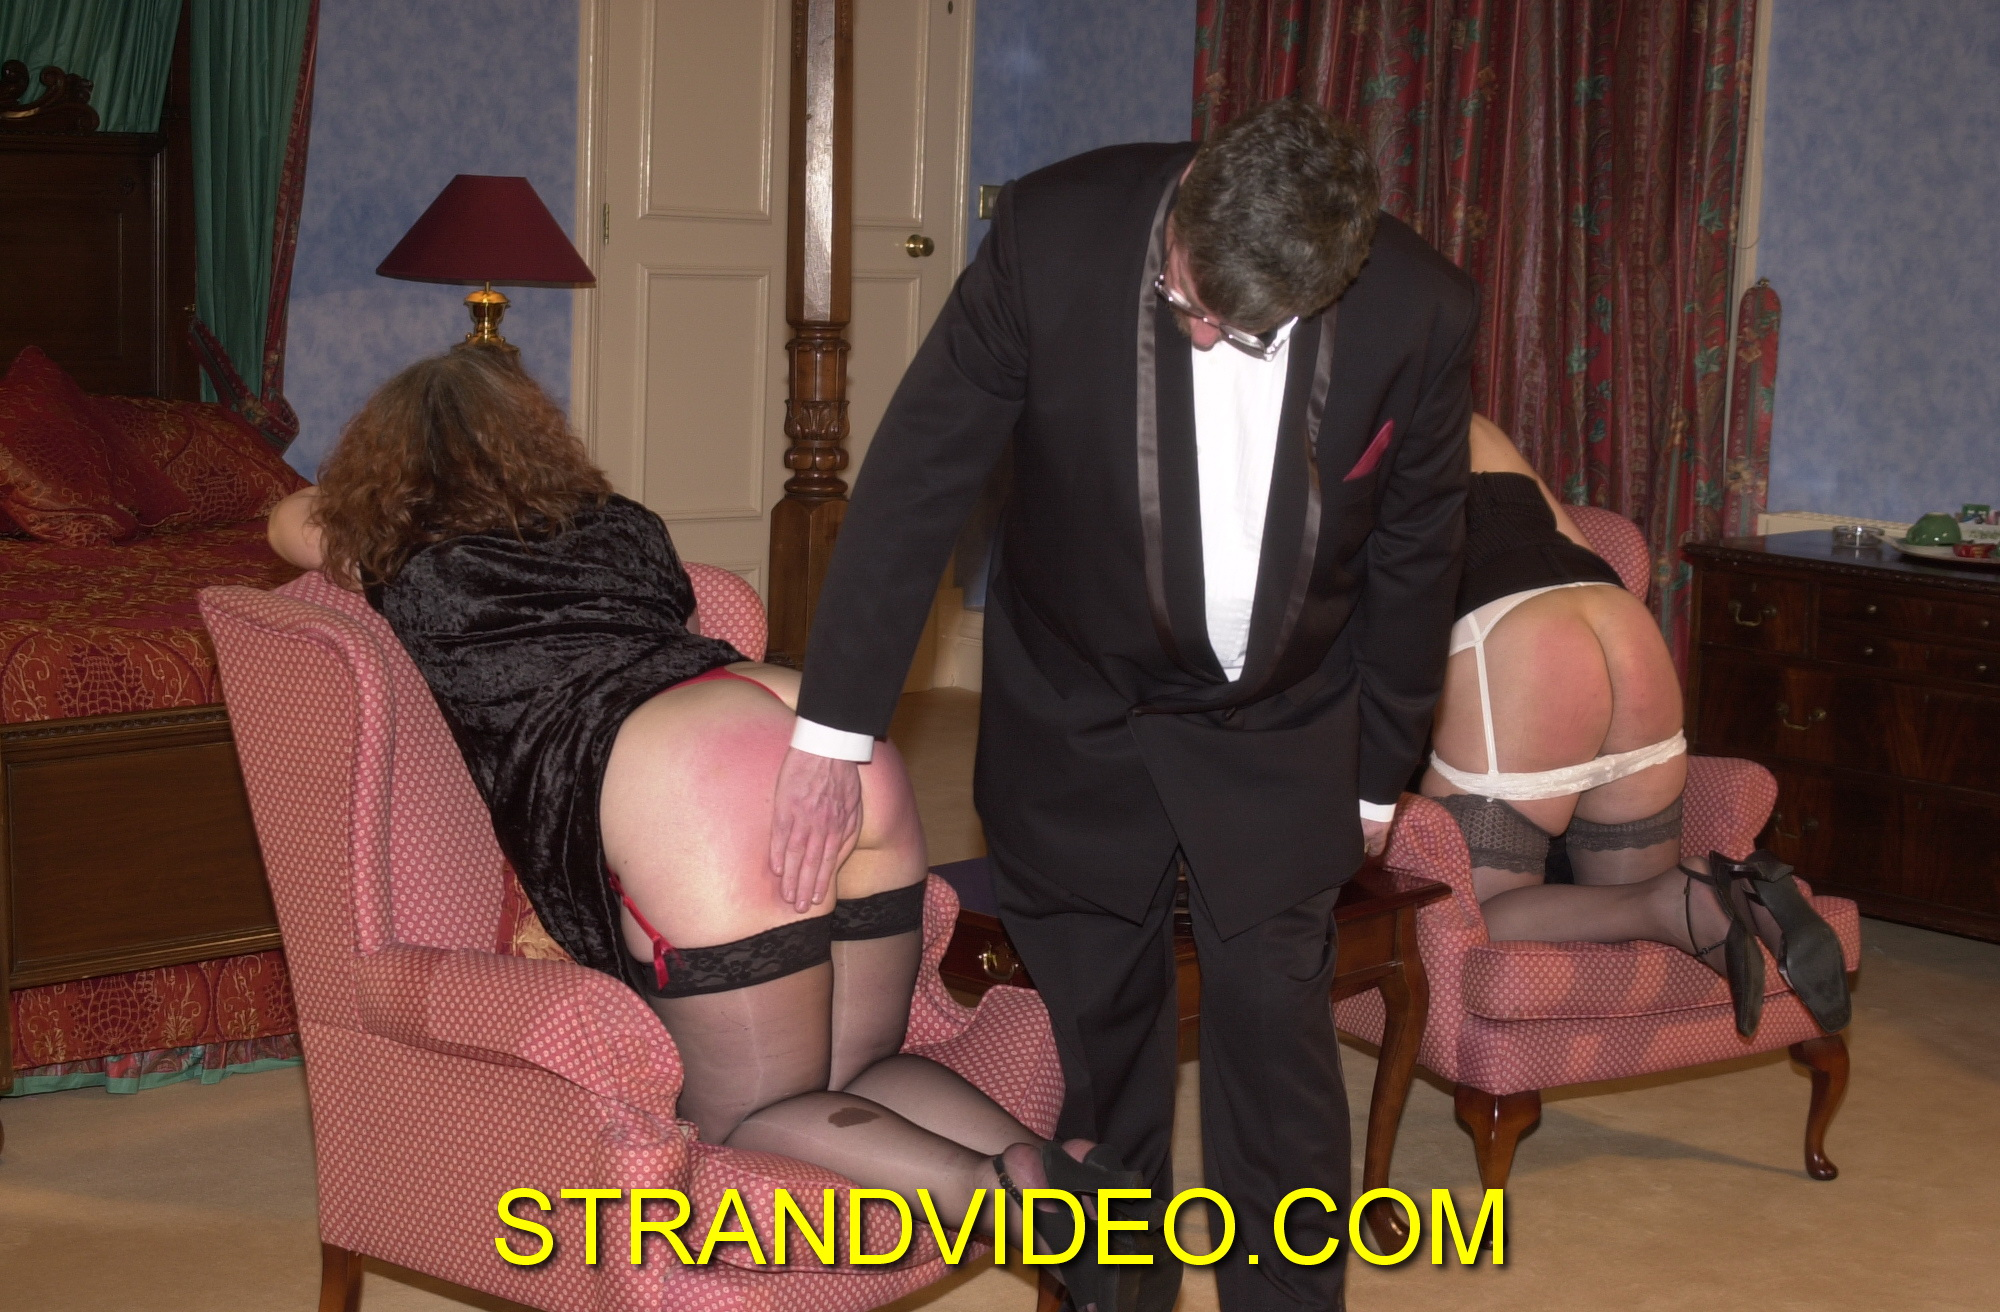 spanking-annie-sue-034.npp485